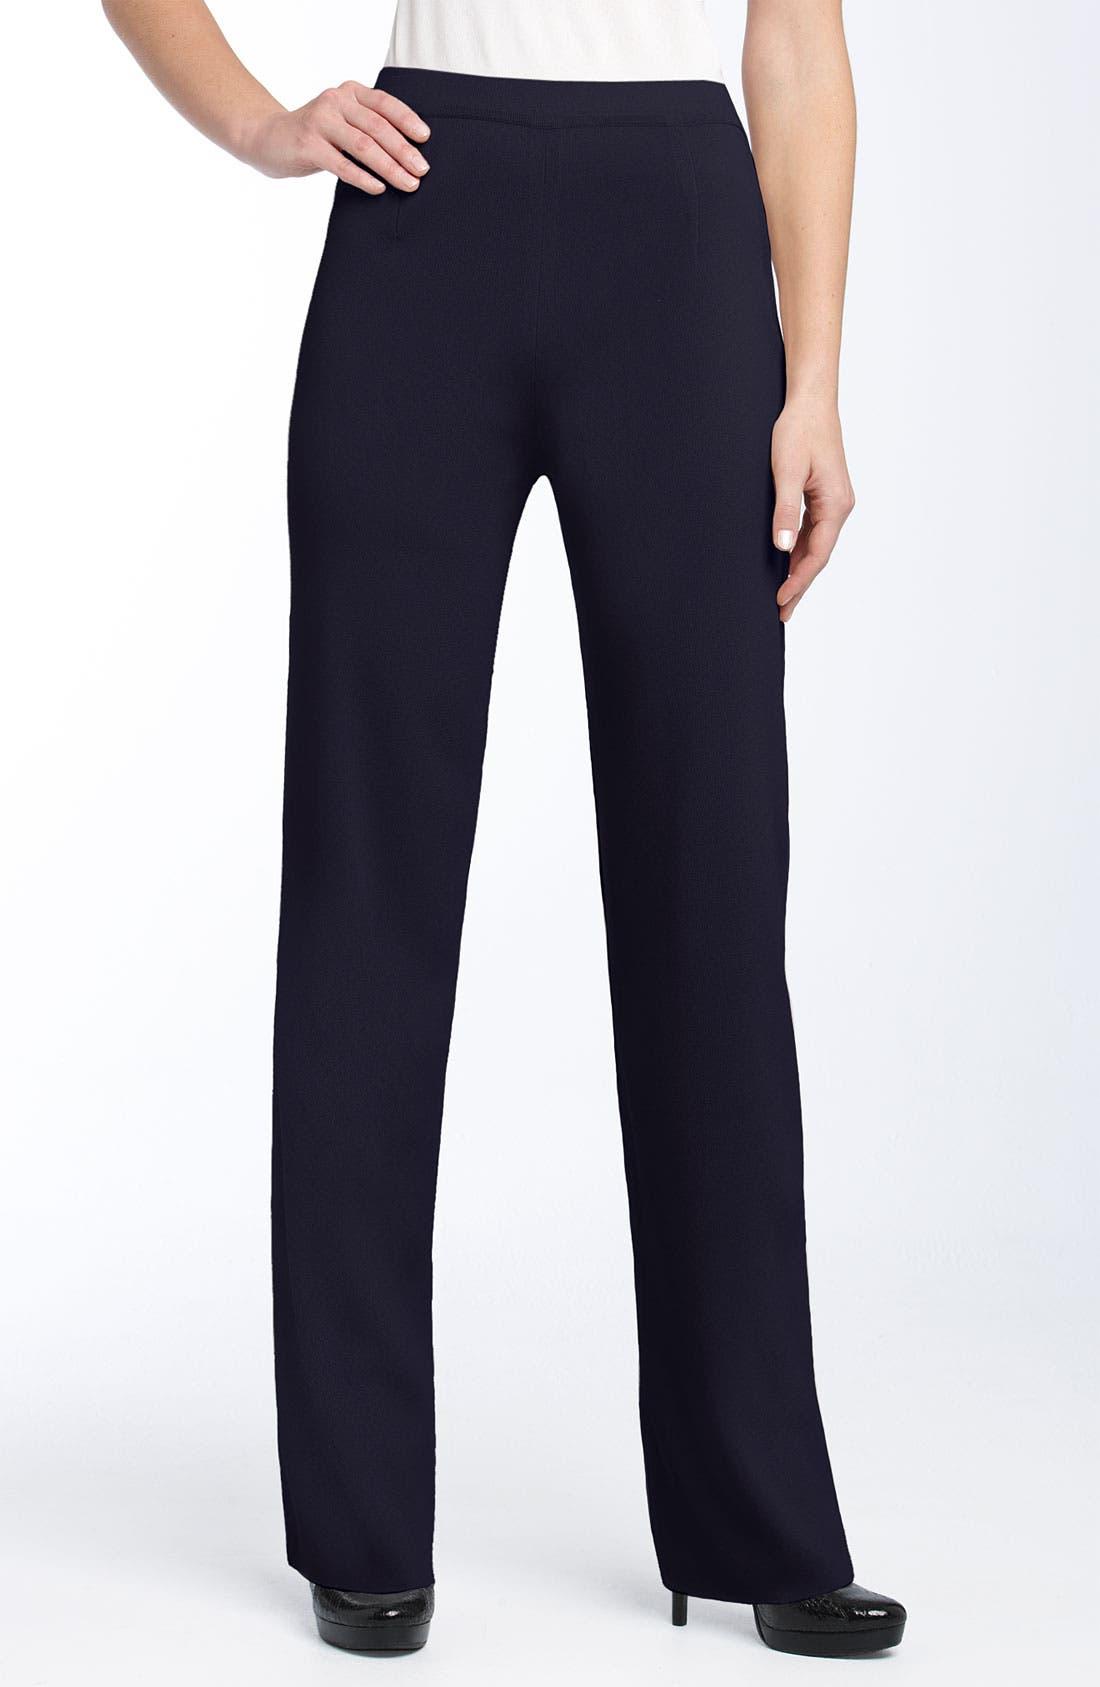 Main Image - Exclusively Misook Slim Knit Pants (Regular & Petite)